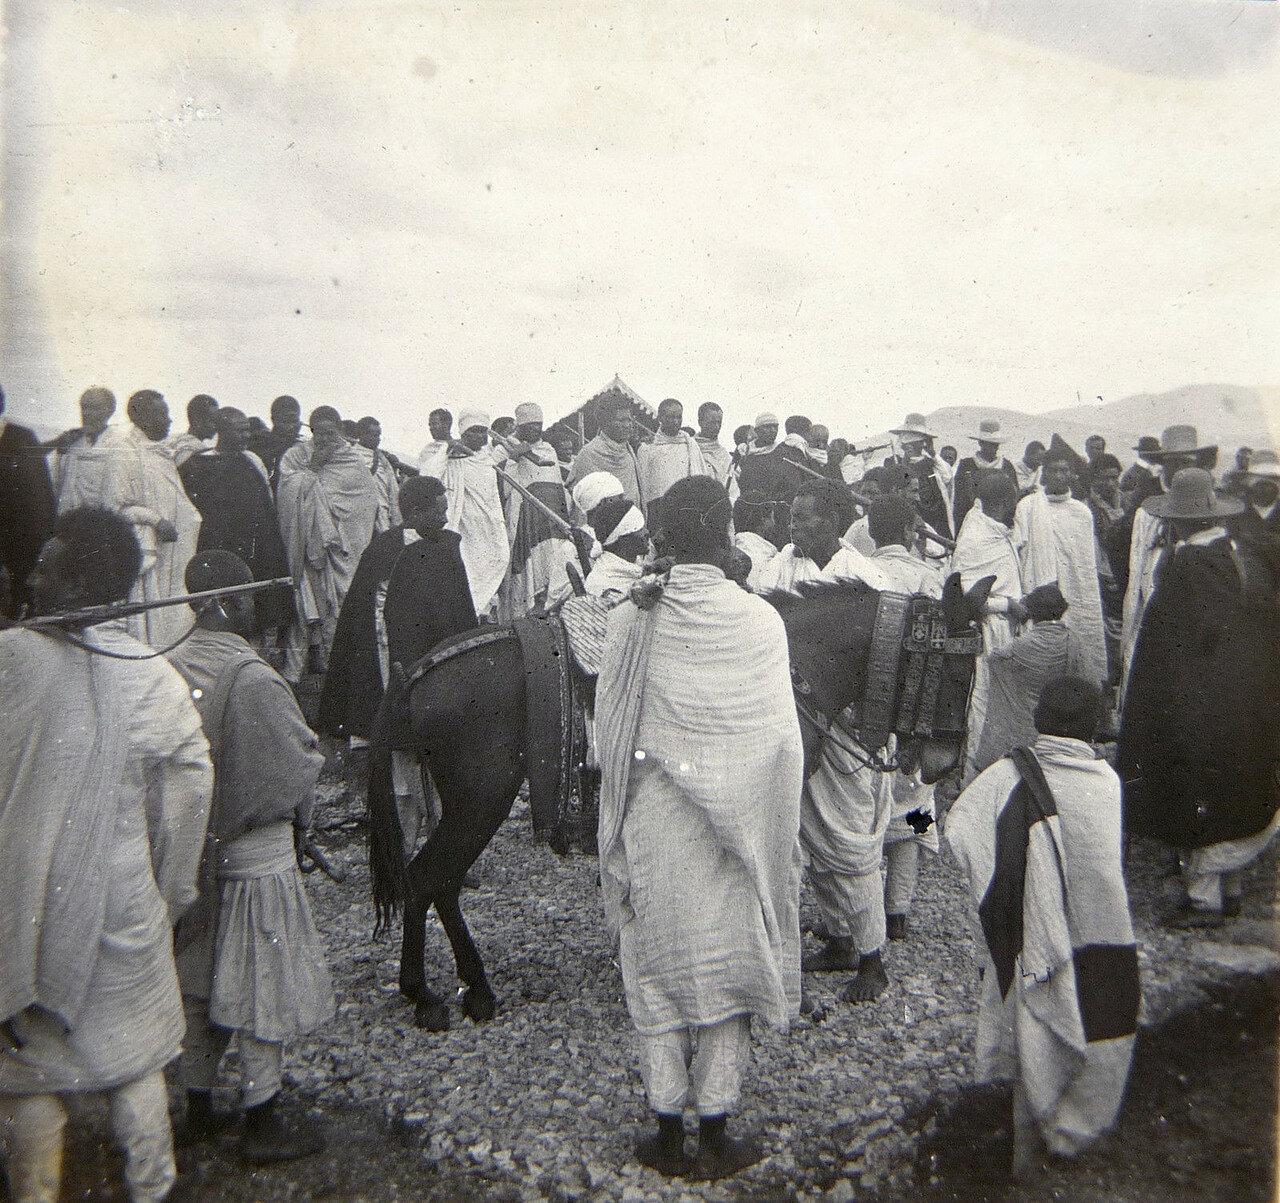 1897. Абиссиния. Император Менелик II на дороге Джибутти - Аддис-Абеба